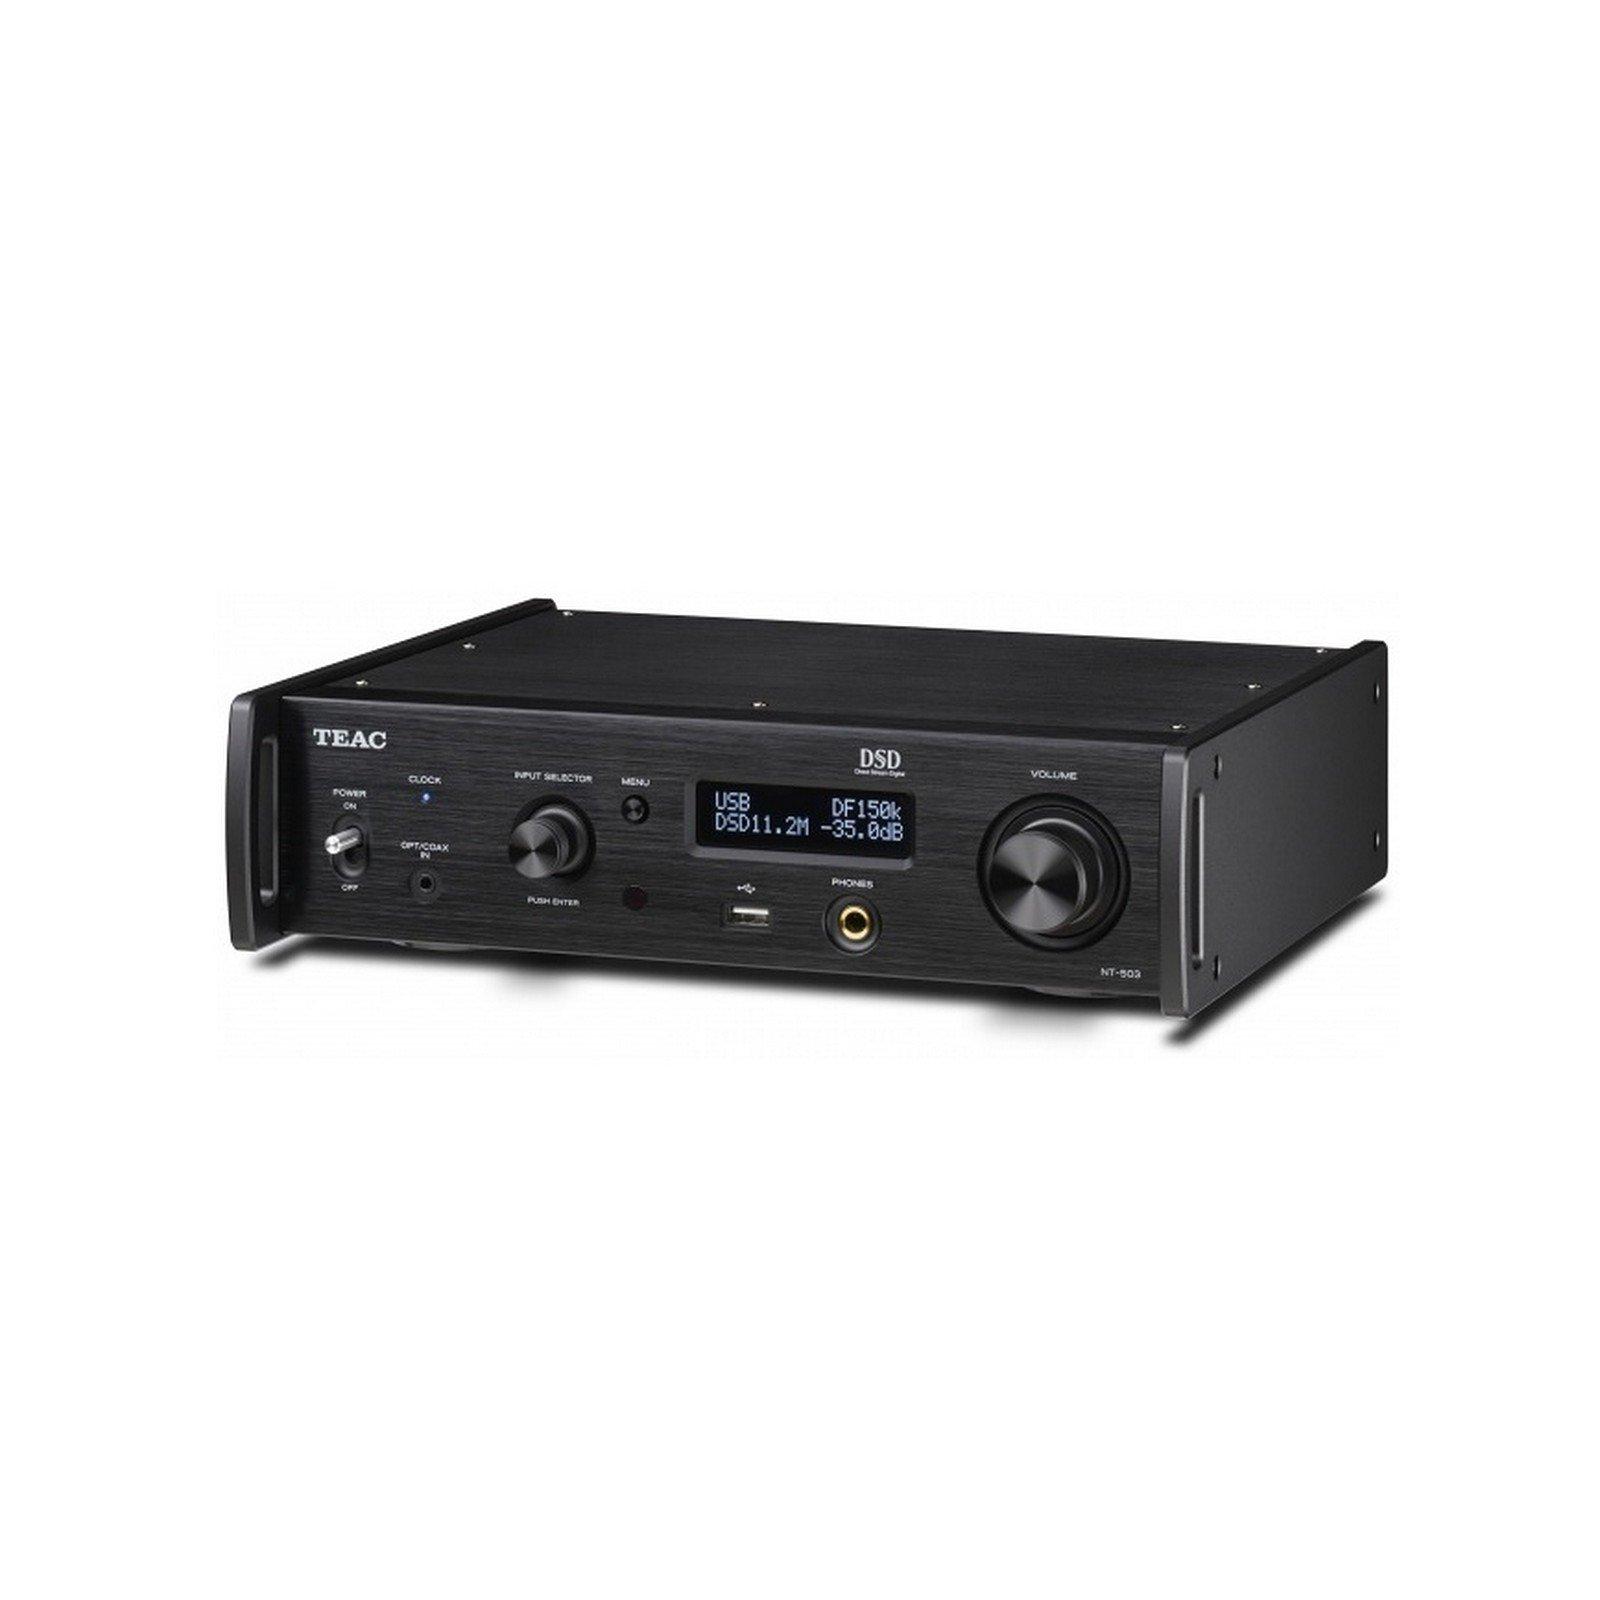 Teac NT-503-B | Dual Monaural USB DAC Bluetooth Network Player Black by Teac